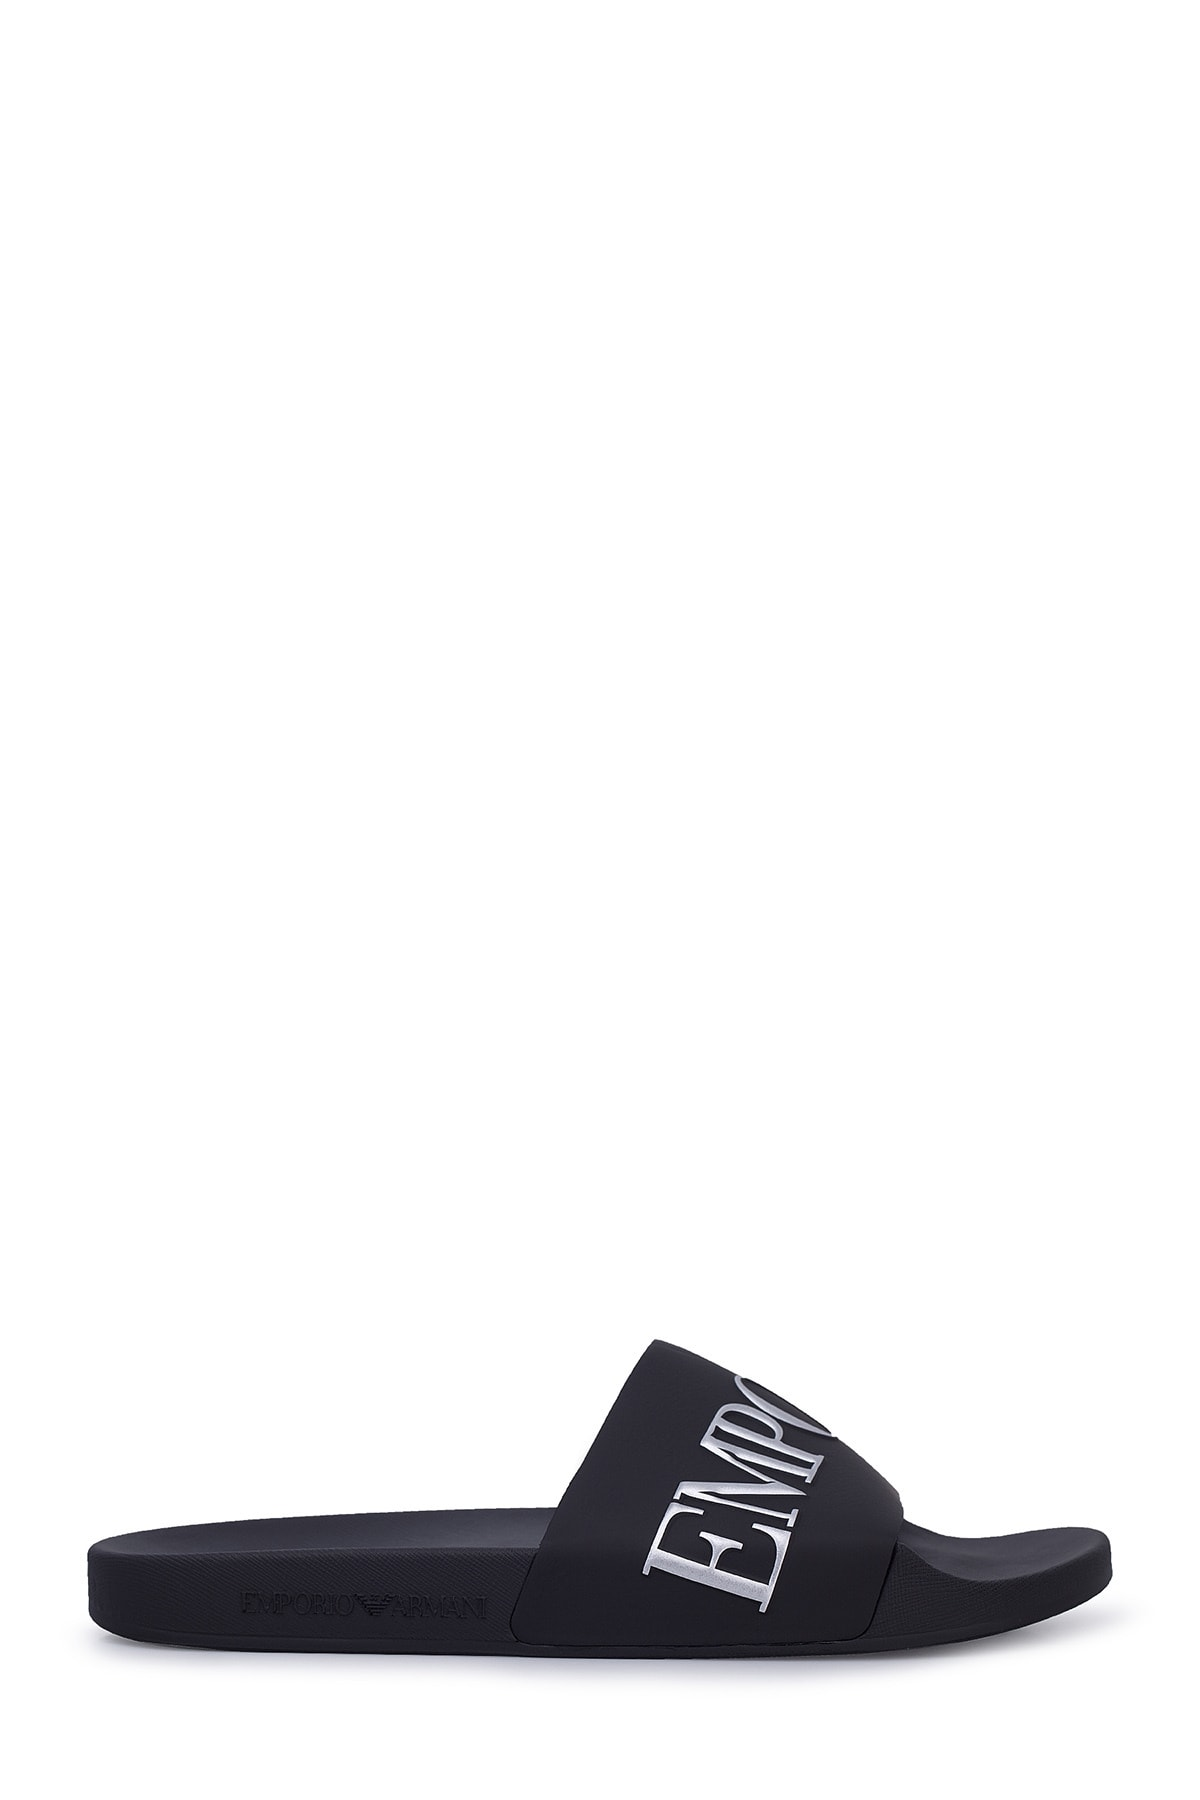 Emporio Armani Erkek Siyah Yazılı Terlik X4ps04 Xm291 M596 1